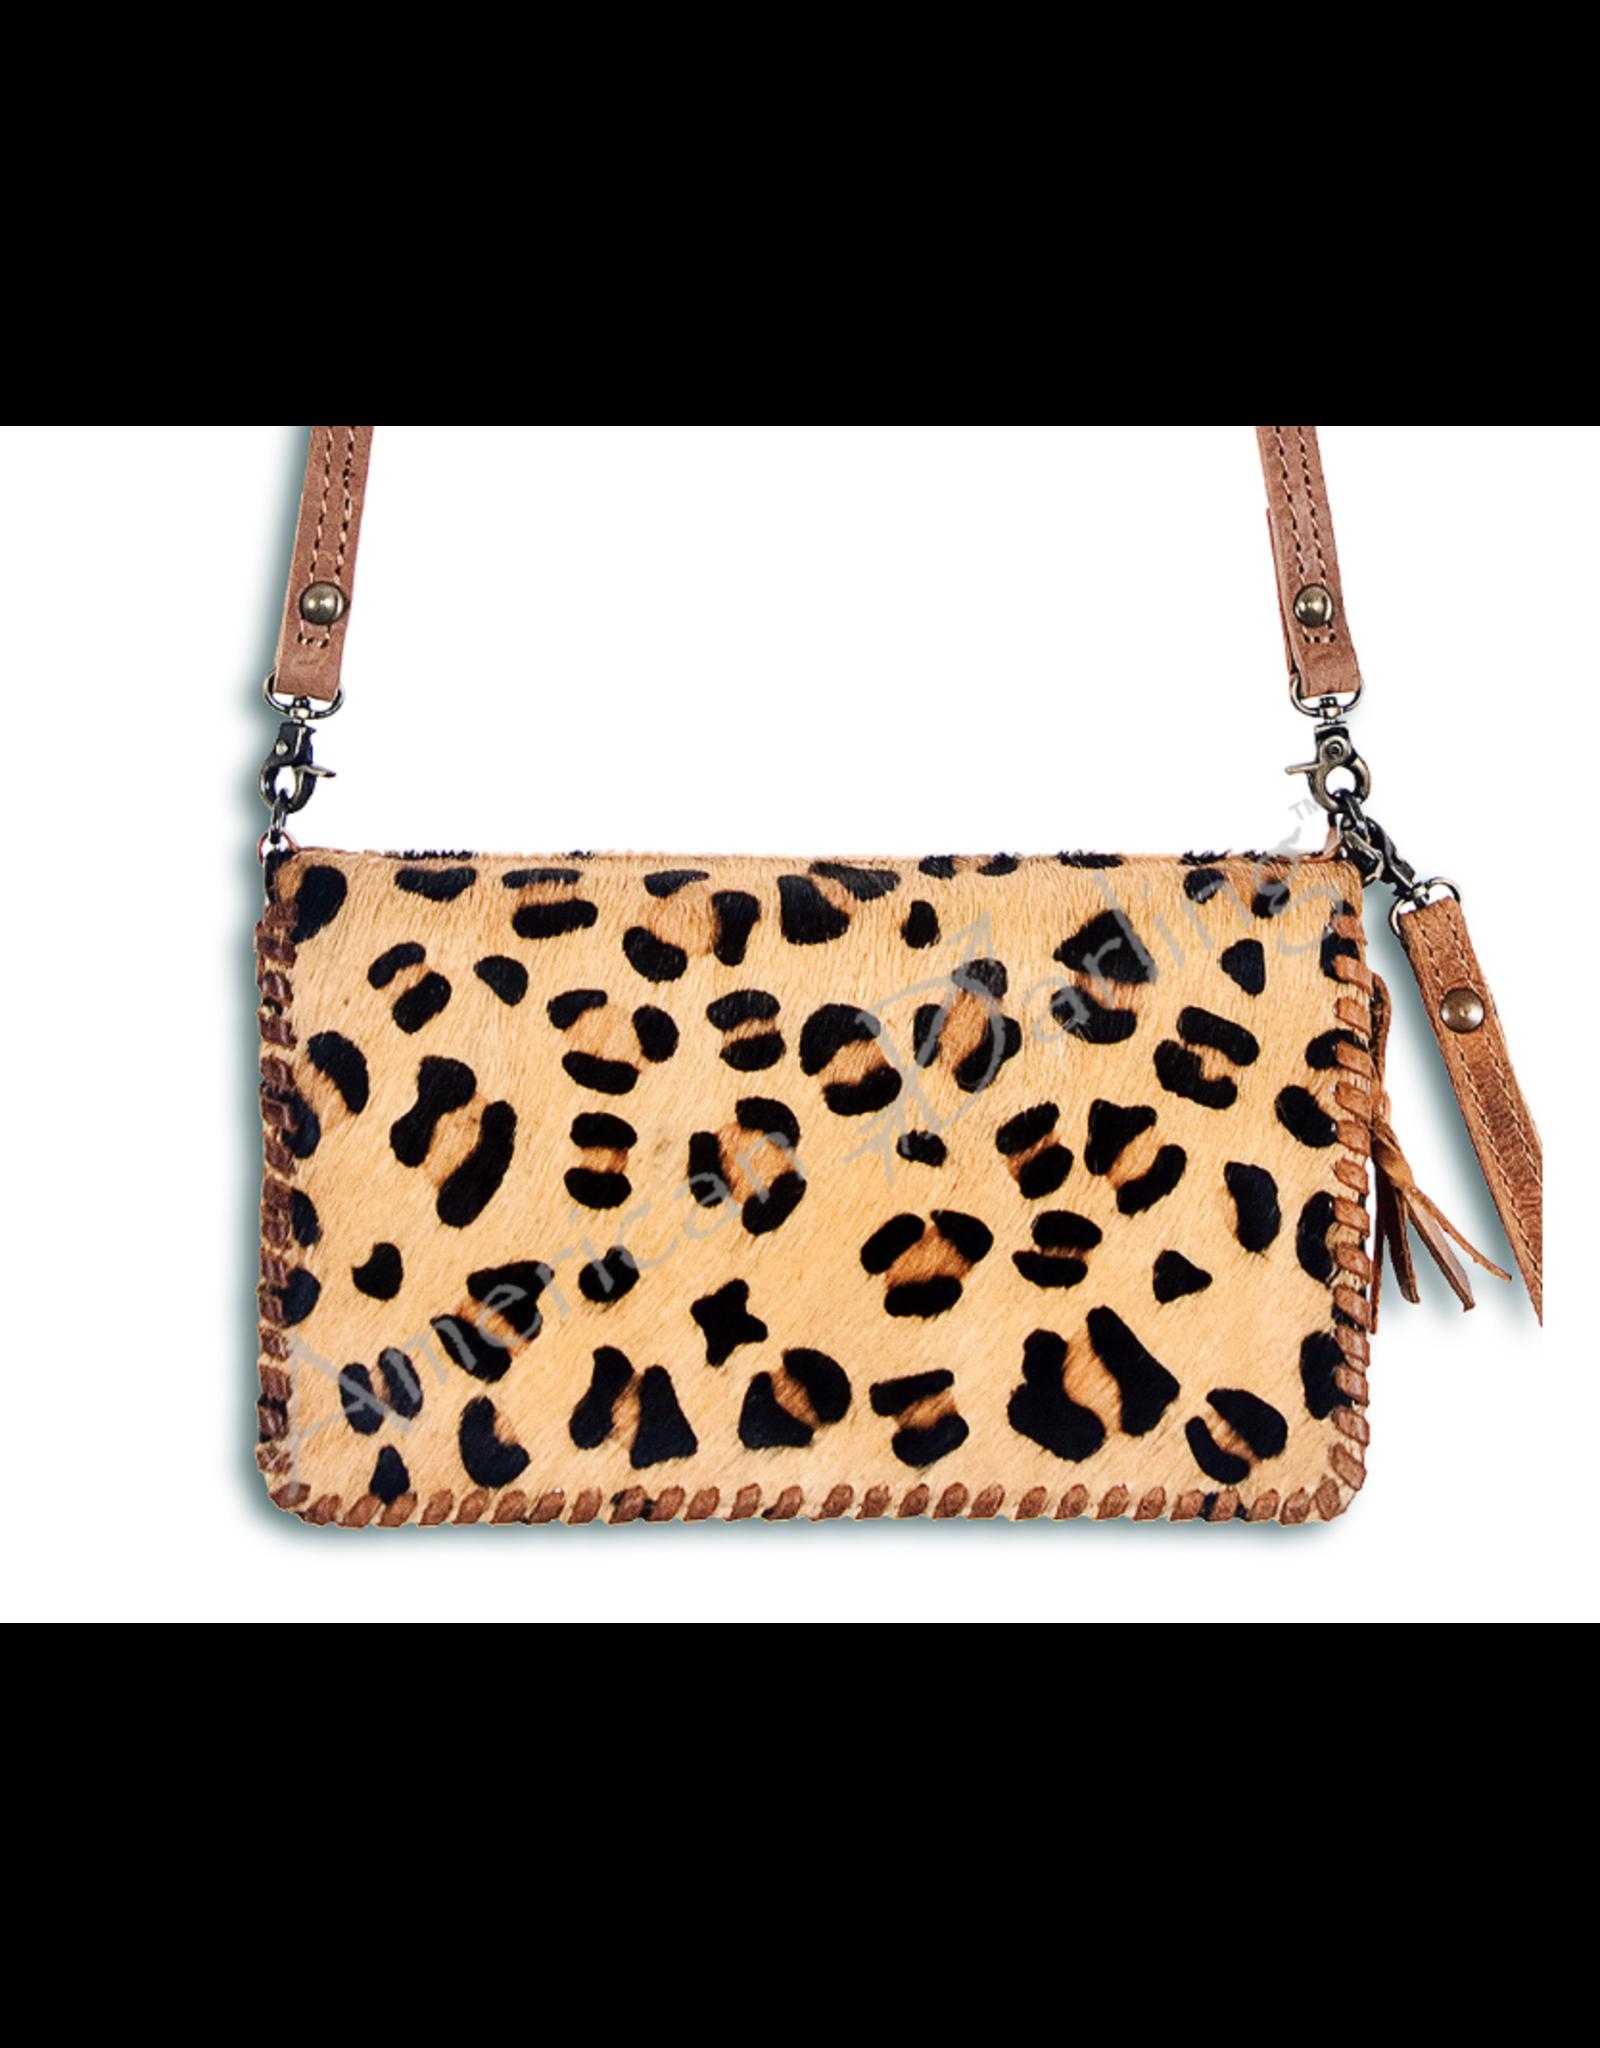 American Darling Cheetah Wallet